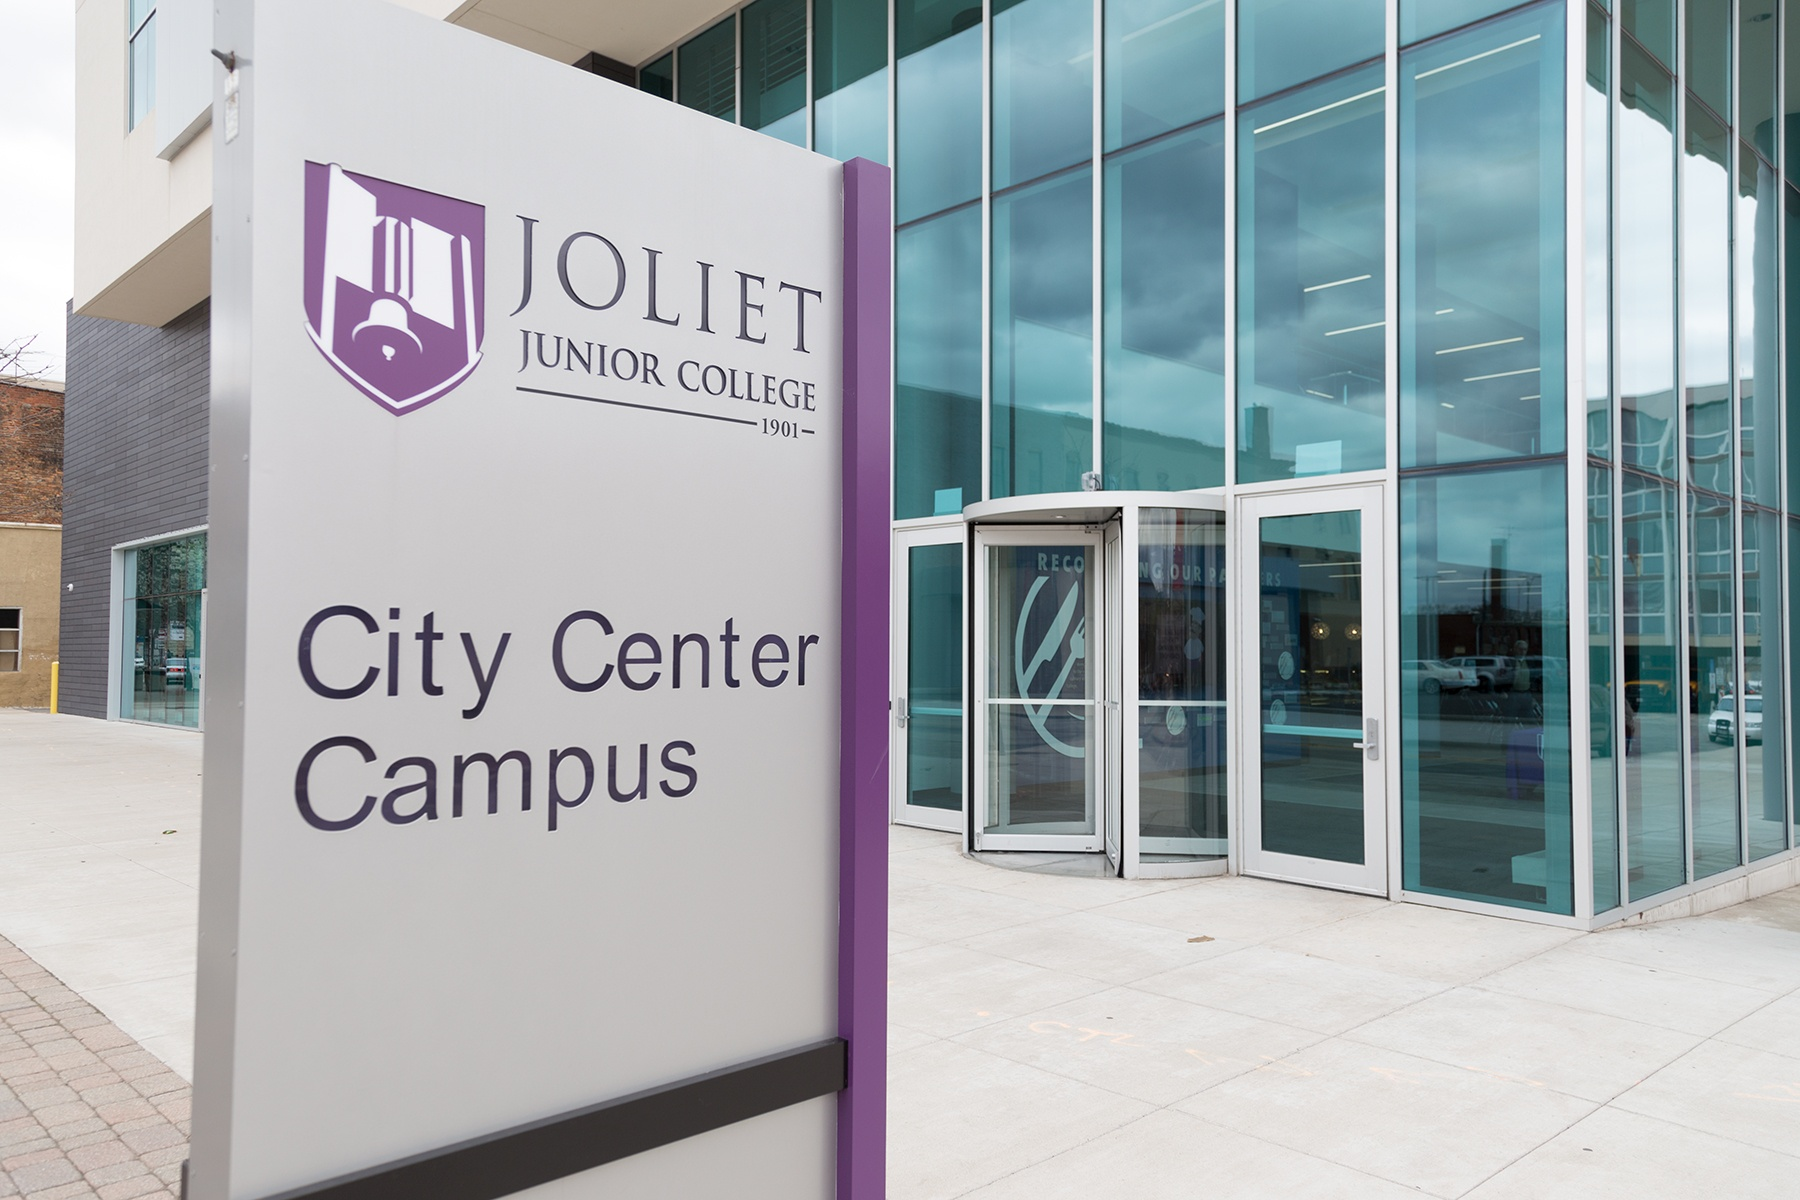 jjc scavenger hunt joliet junior college city center campus building